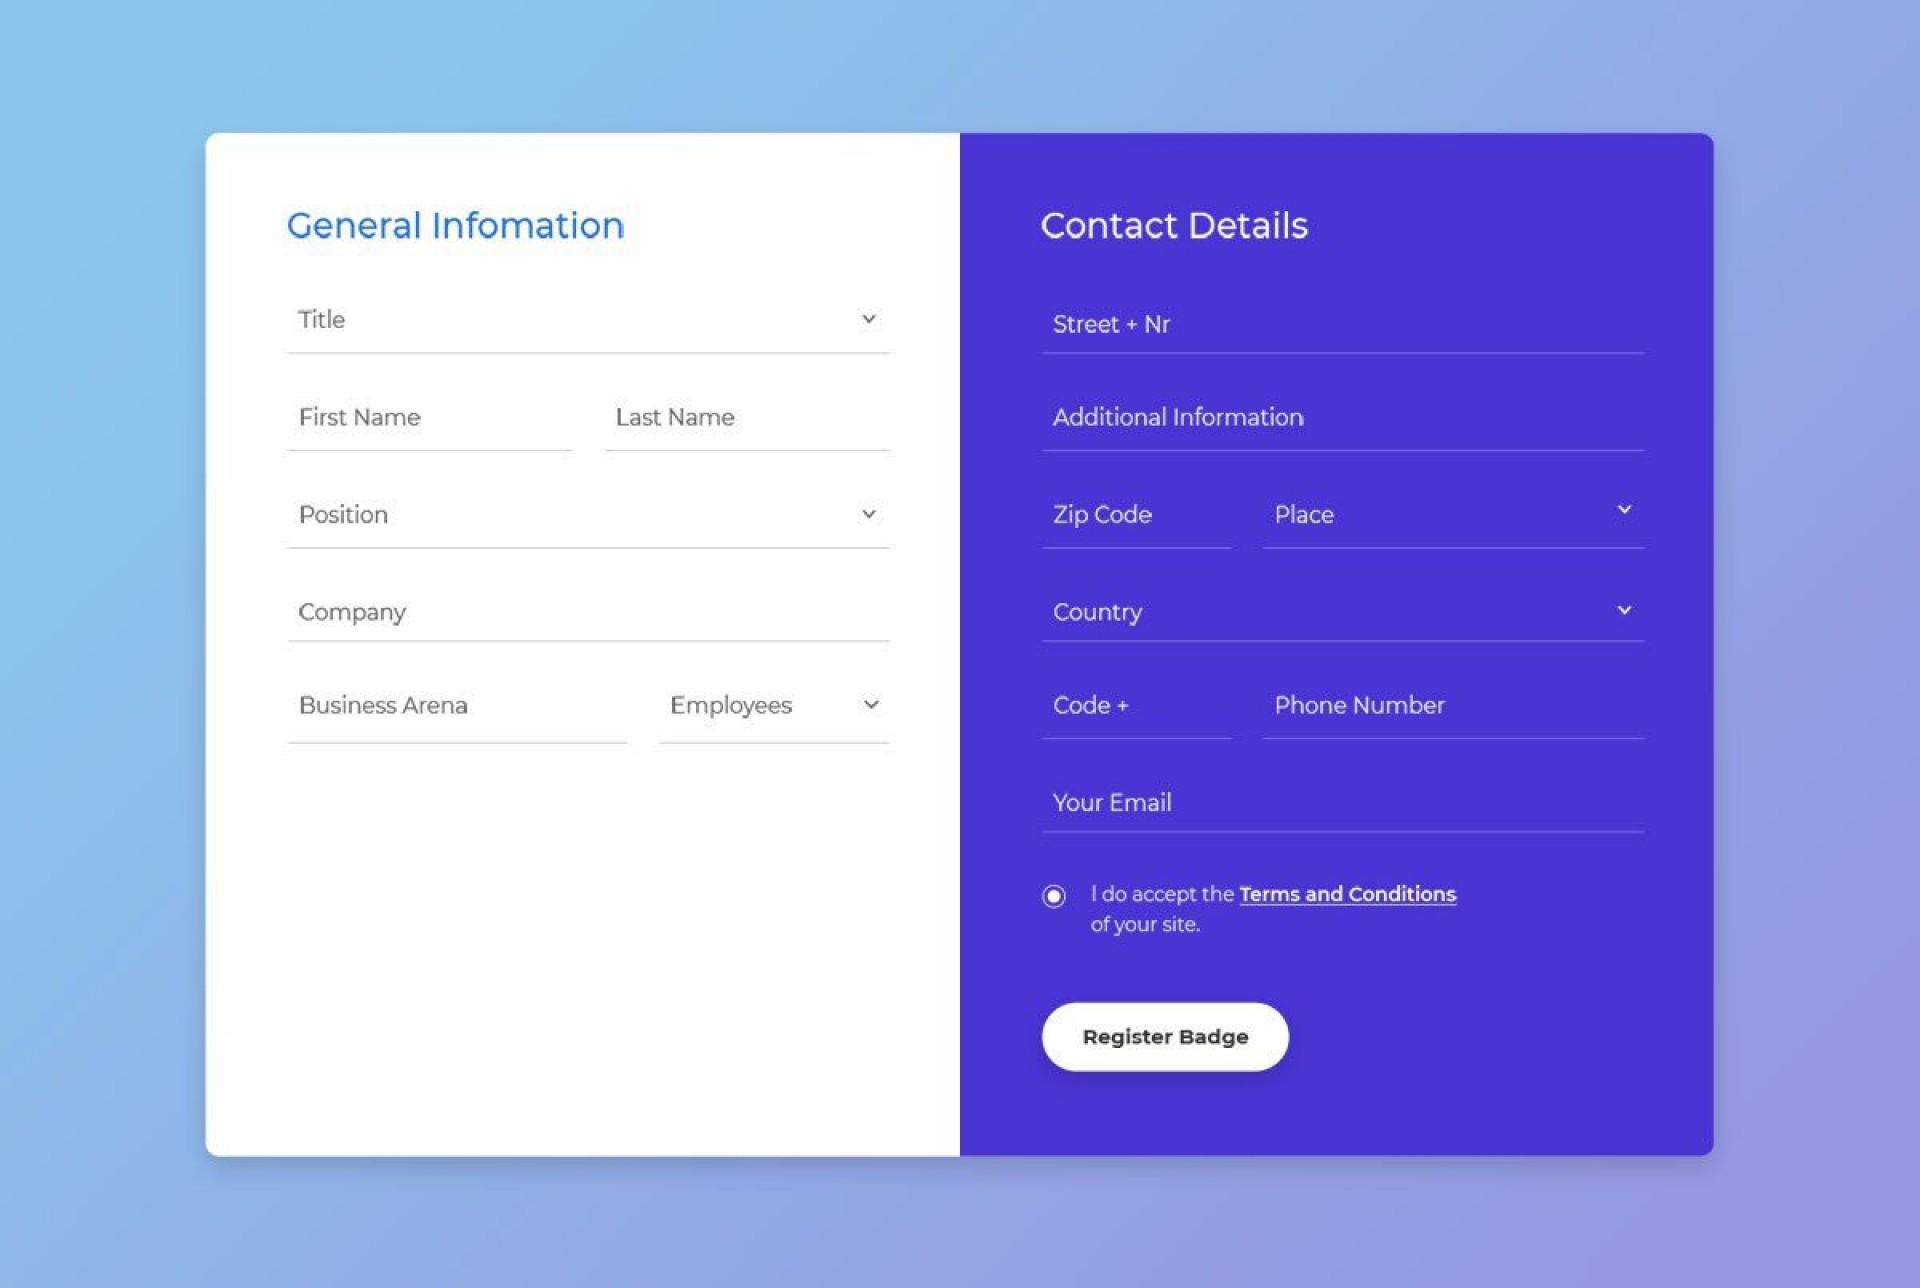 004 Imposing Free Html Form Template Idea  Templates Survey Application Download Registration1920